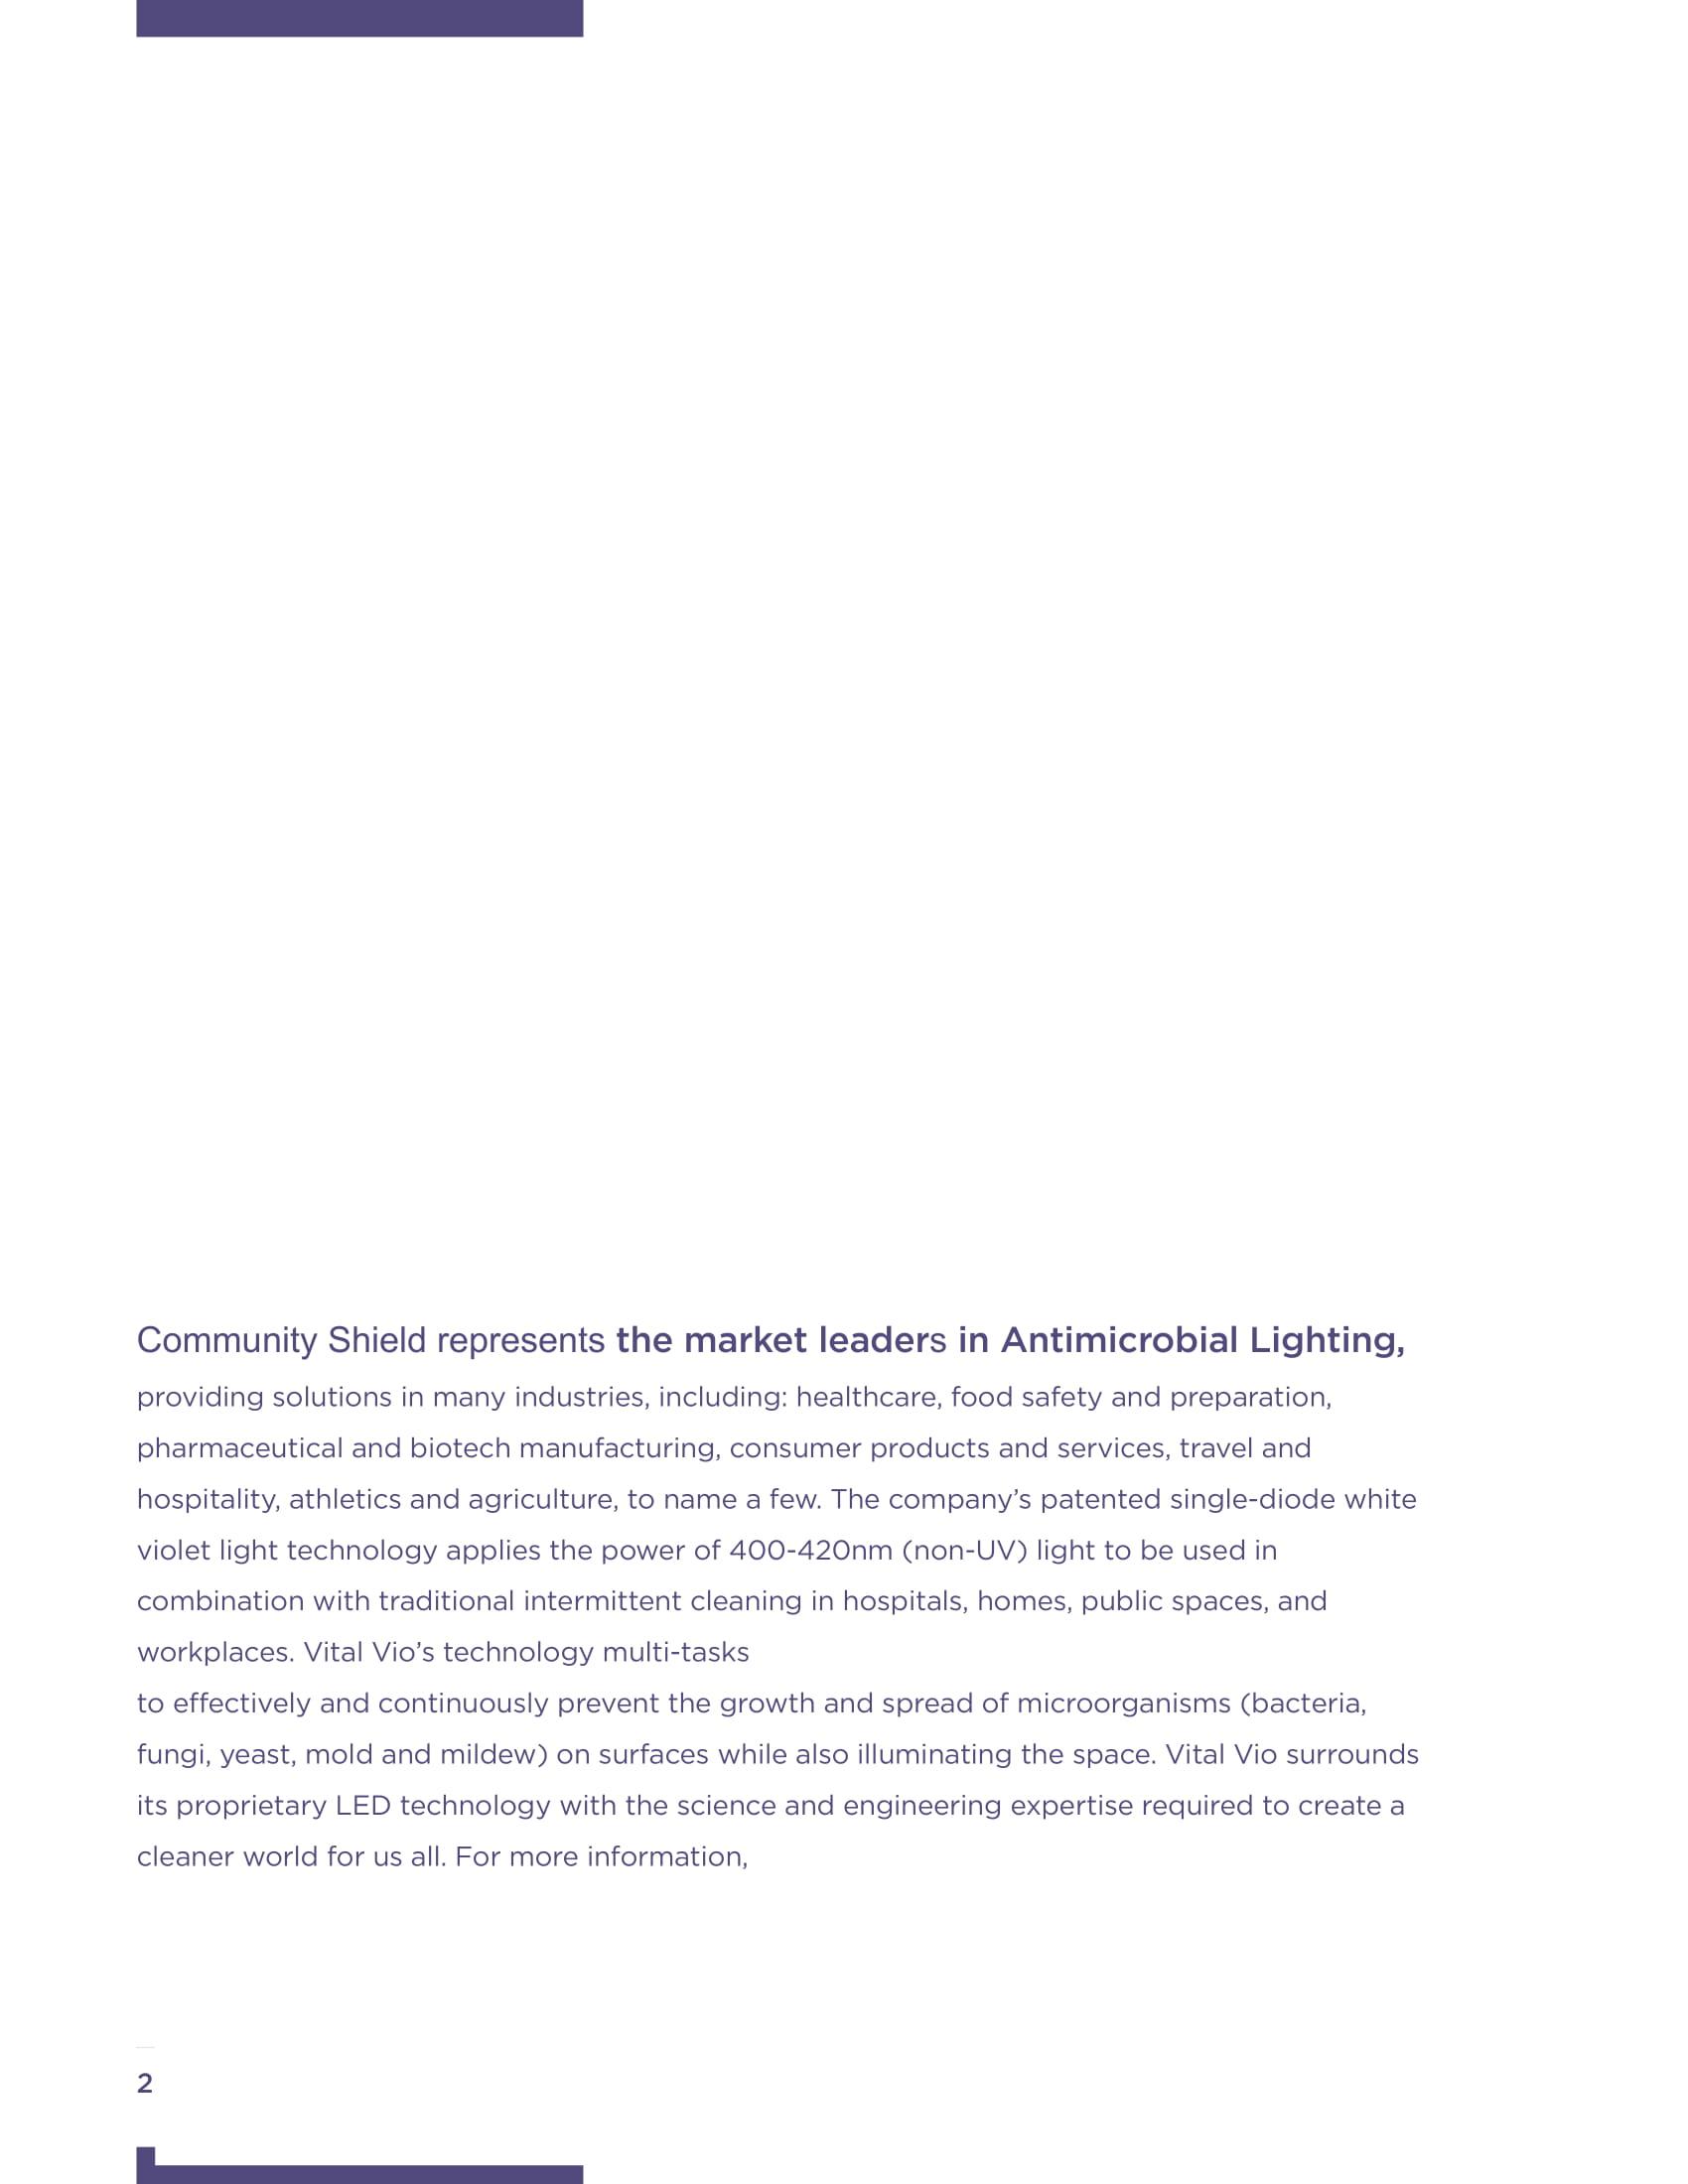 Community Shield Antimicrobial Lighting